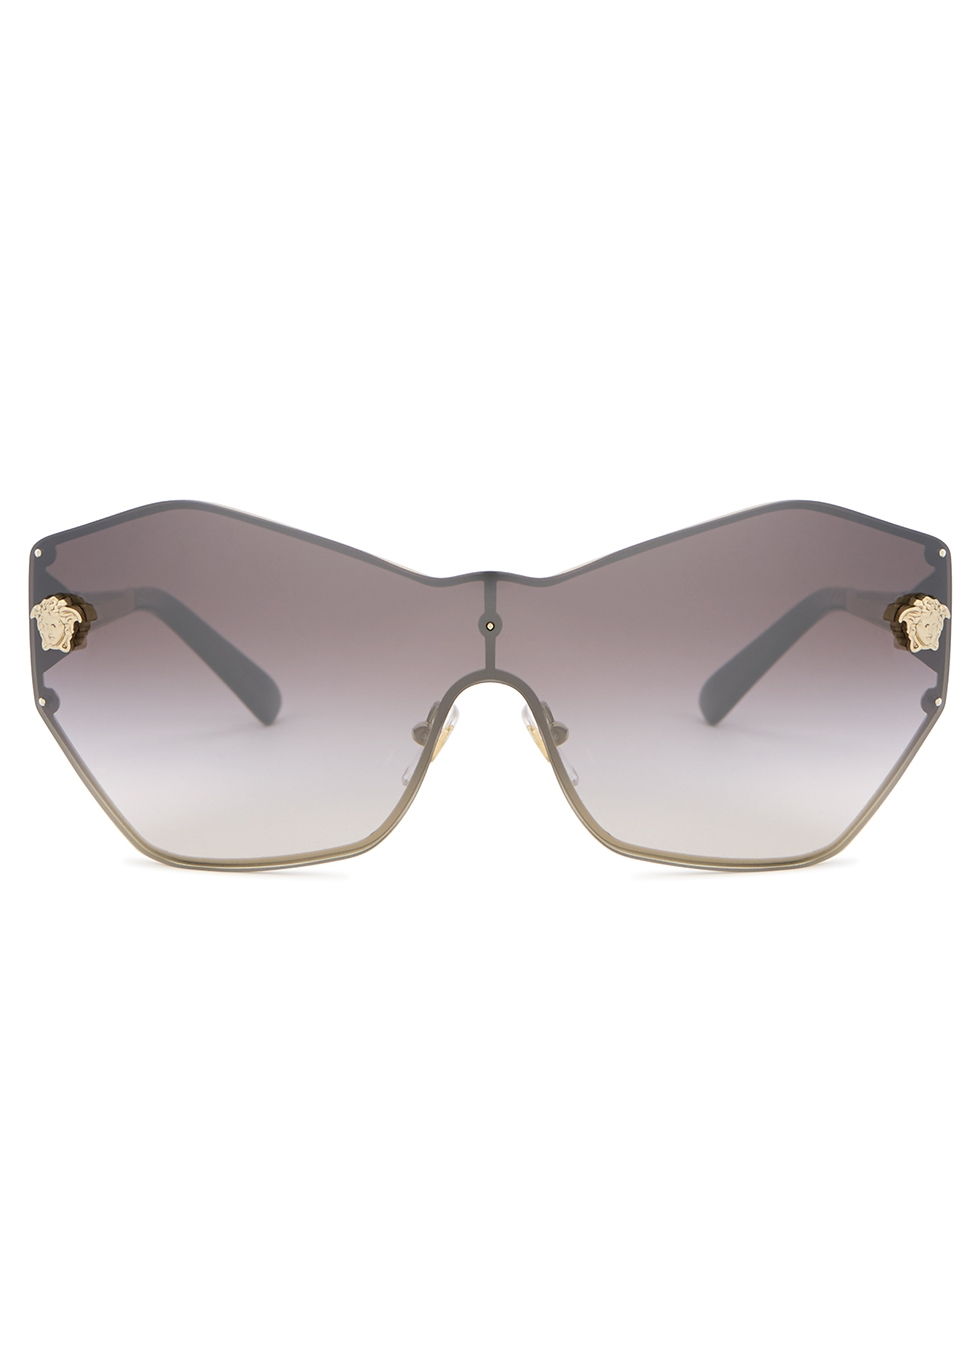 Gold-tone wrap-around sunglasses - Versace